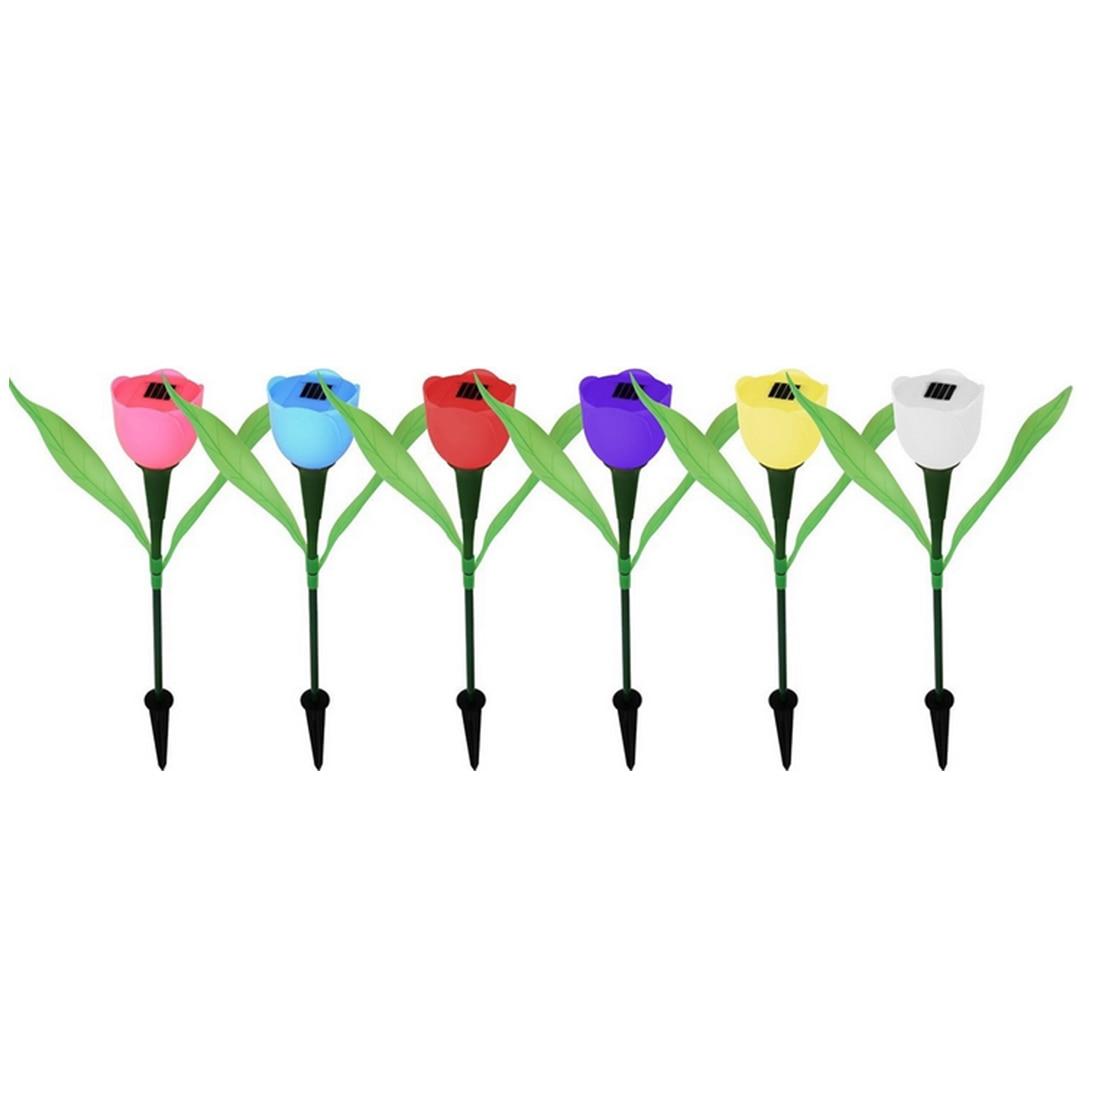 LED Solar Power Garden Lights Colorful Flower Tulip Lamp For Outdoor Landscaping Park Lawns Grasses Christmas Decoration